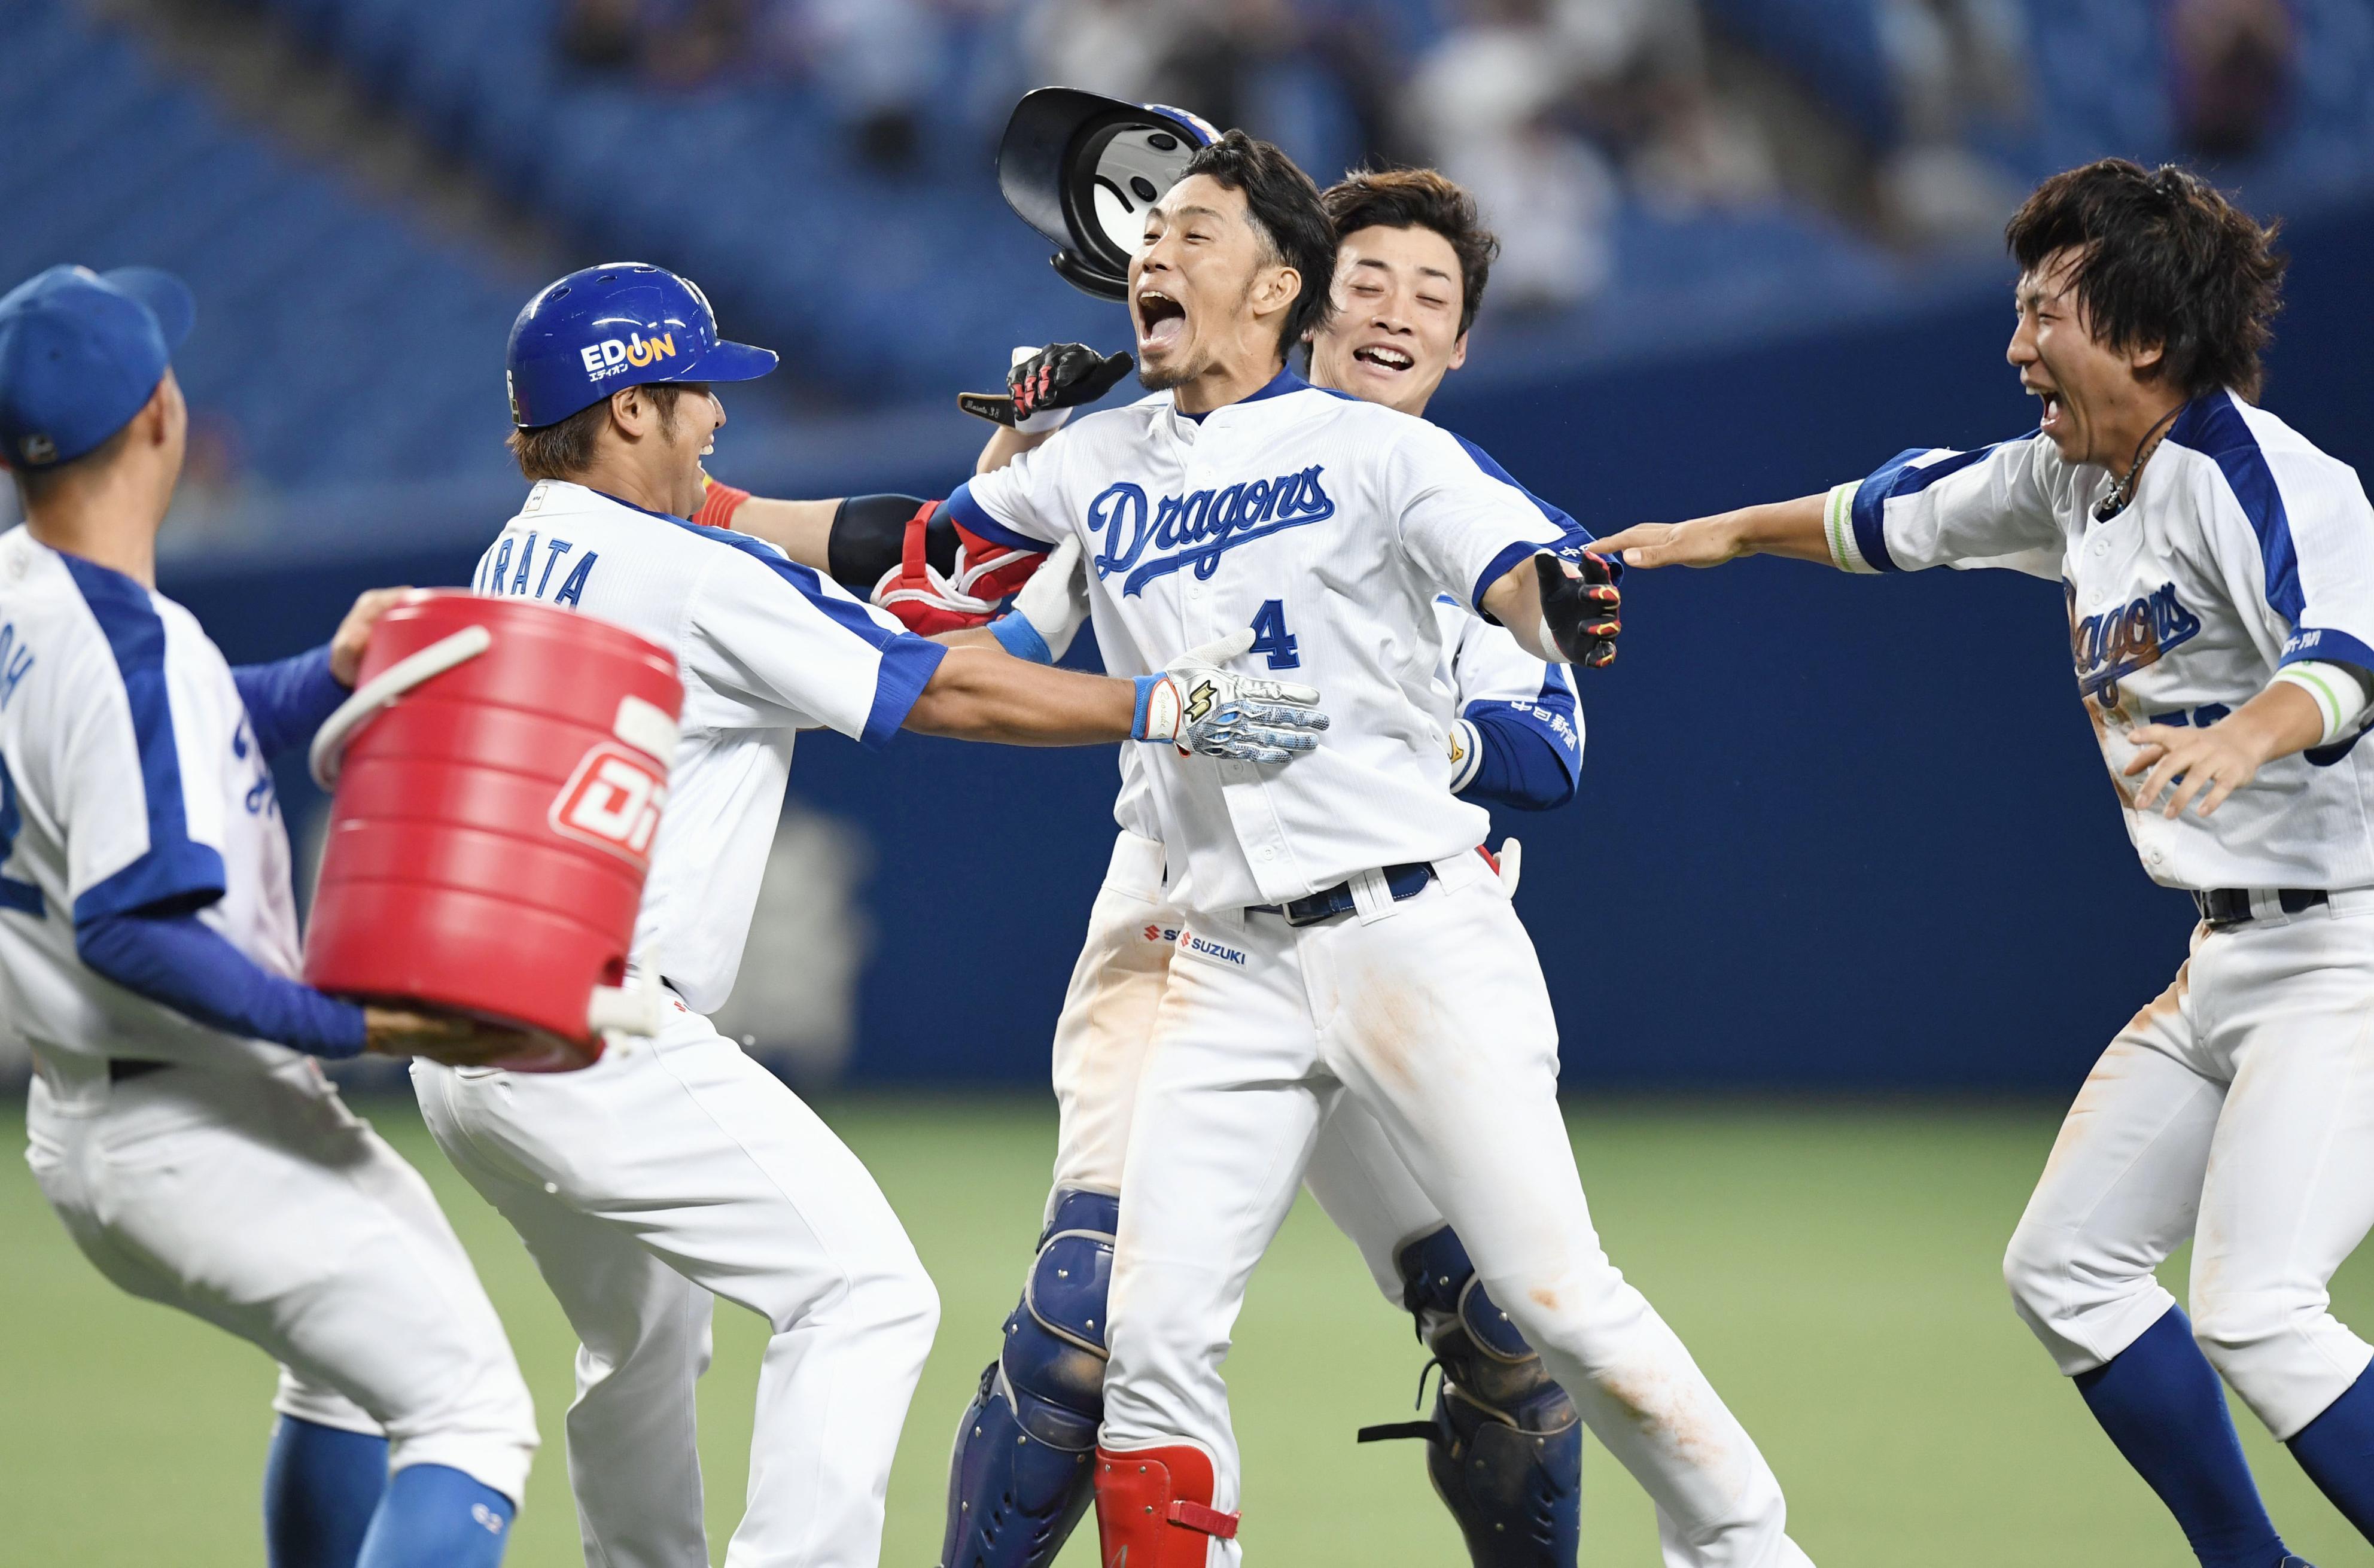 BASEBALL GATE              プロ野球            9回2死から劇的逆転劇!中日がサヨナラ勝ち!